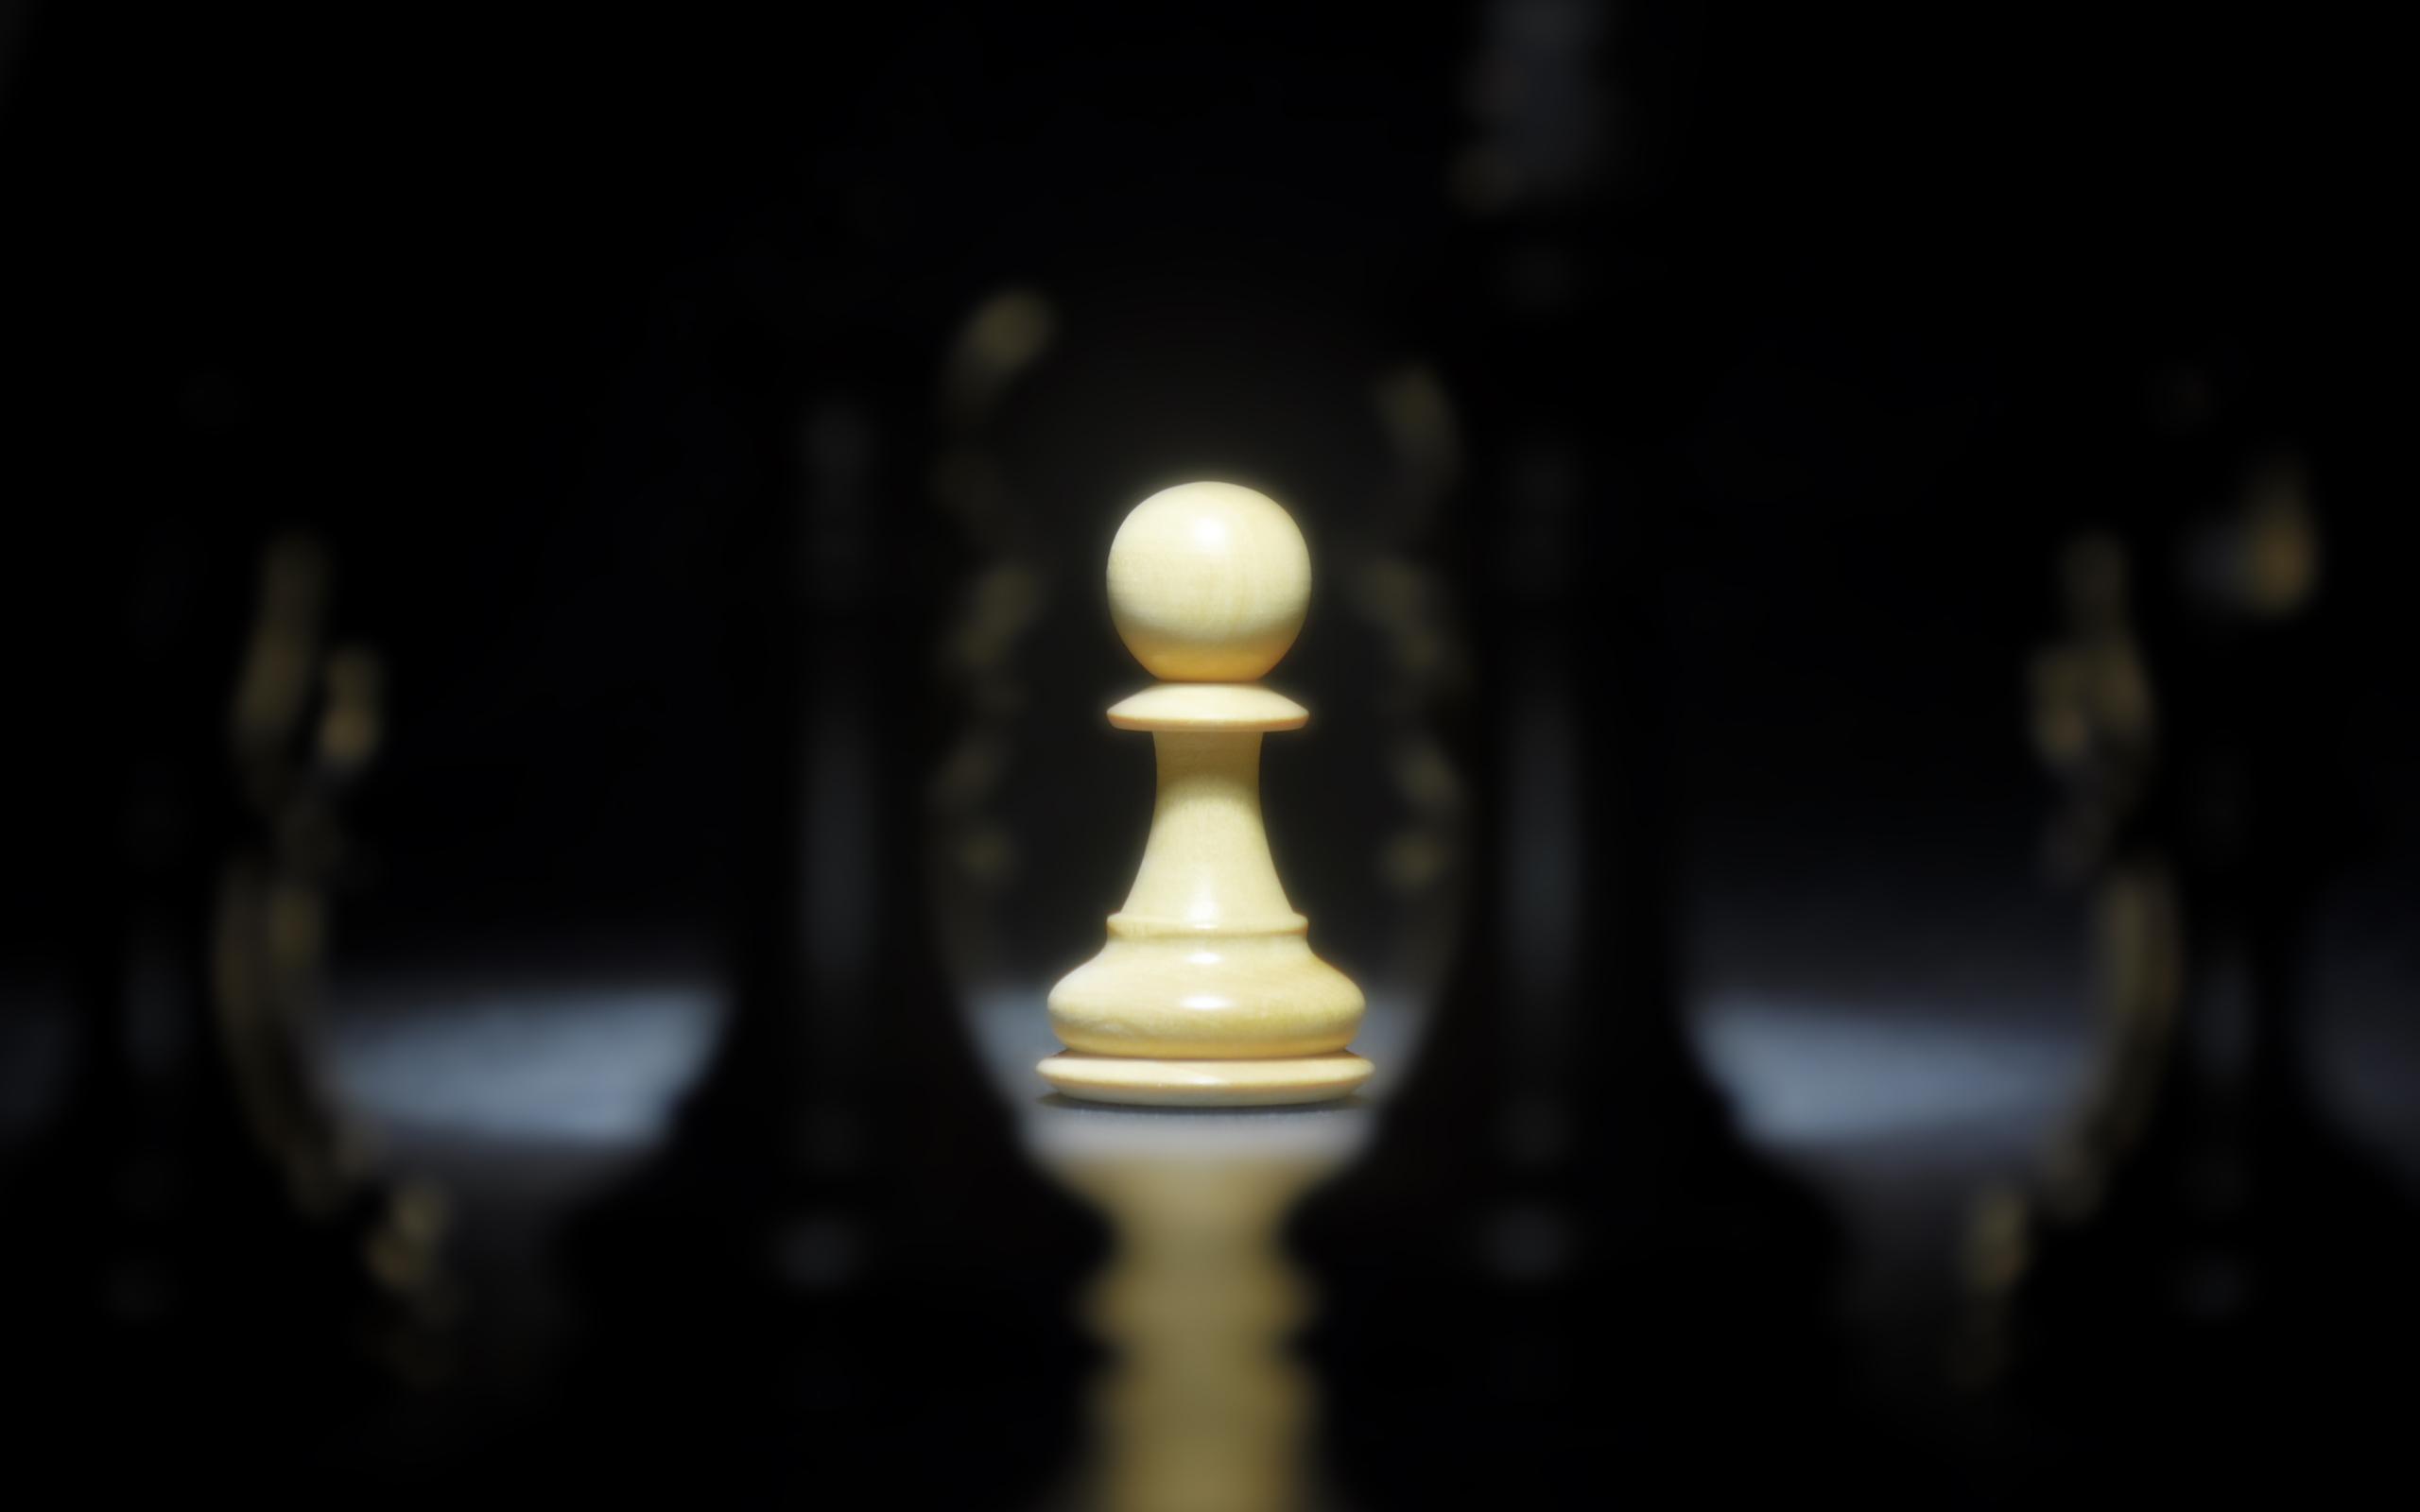 [47+] Chess Wallpaper Widescreen on WallpaperSafari